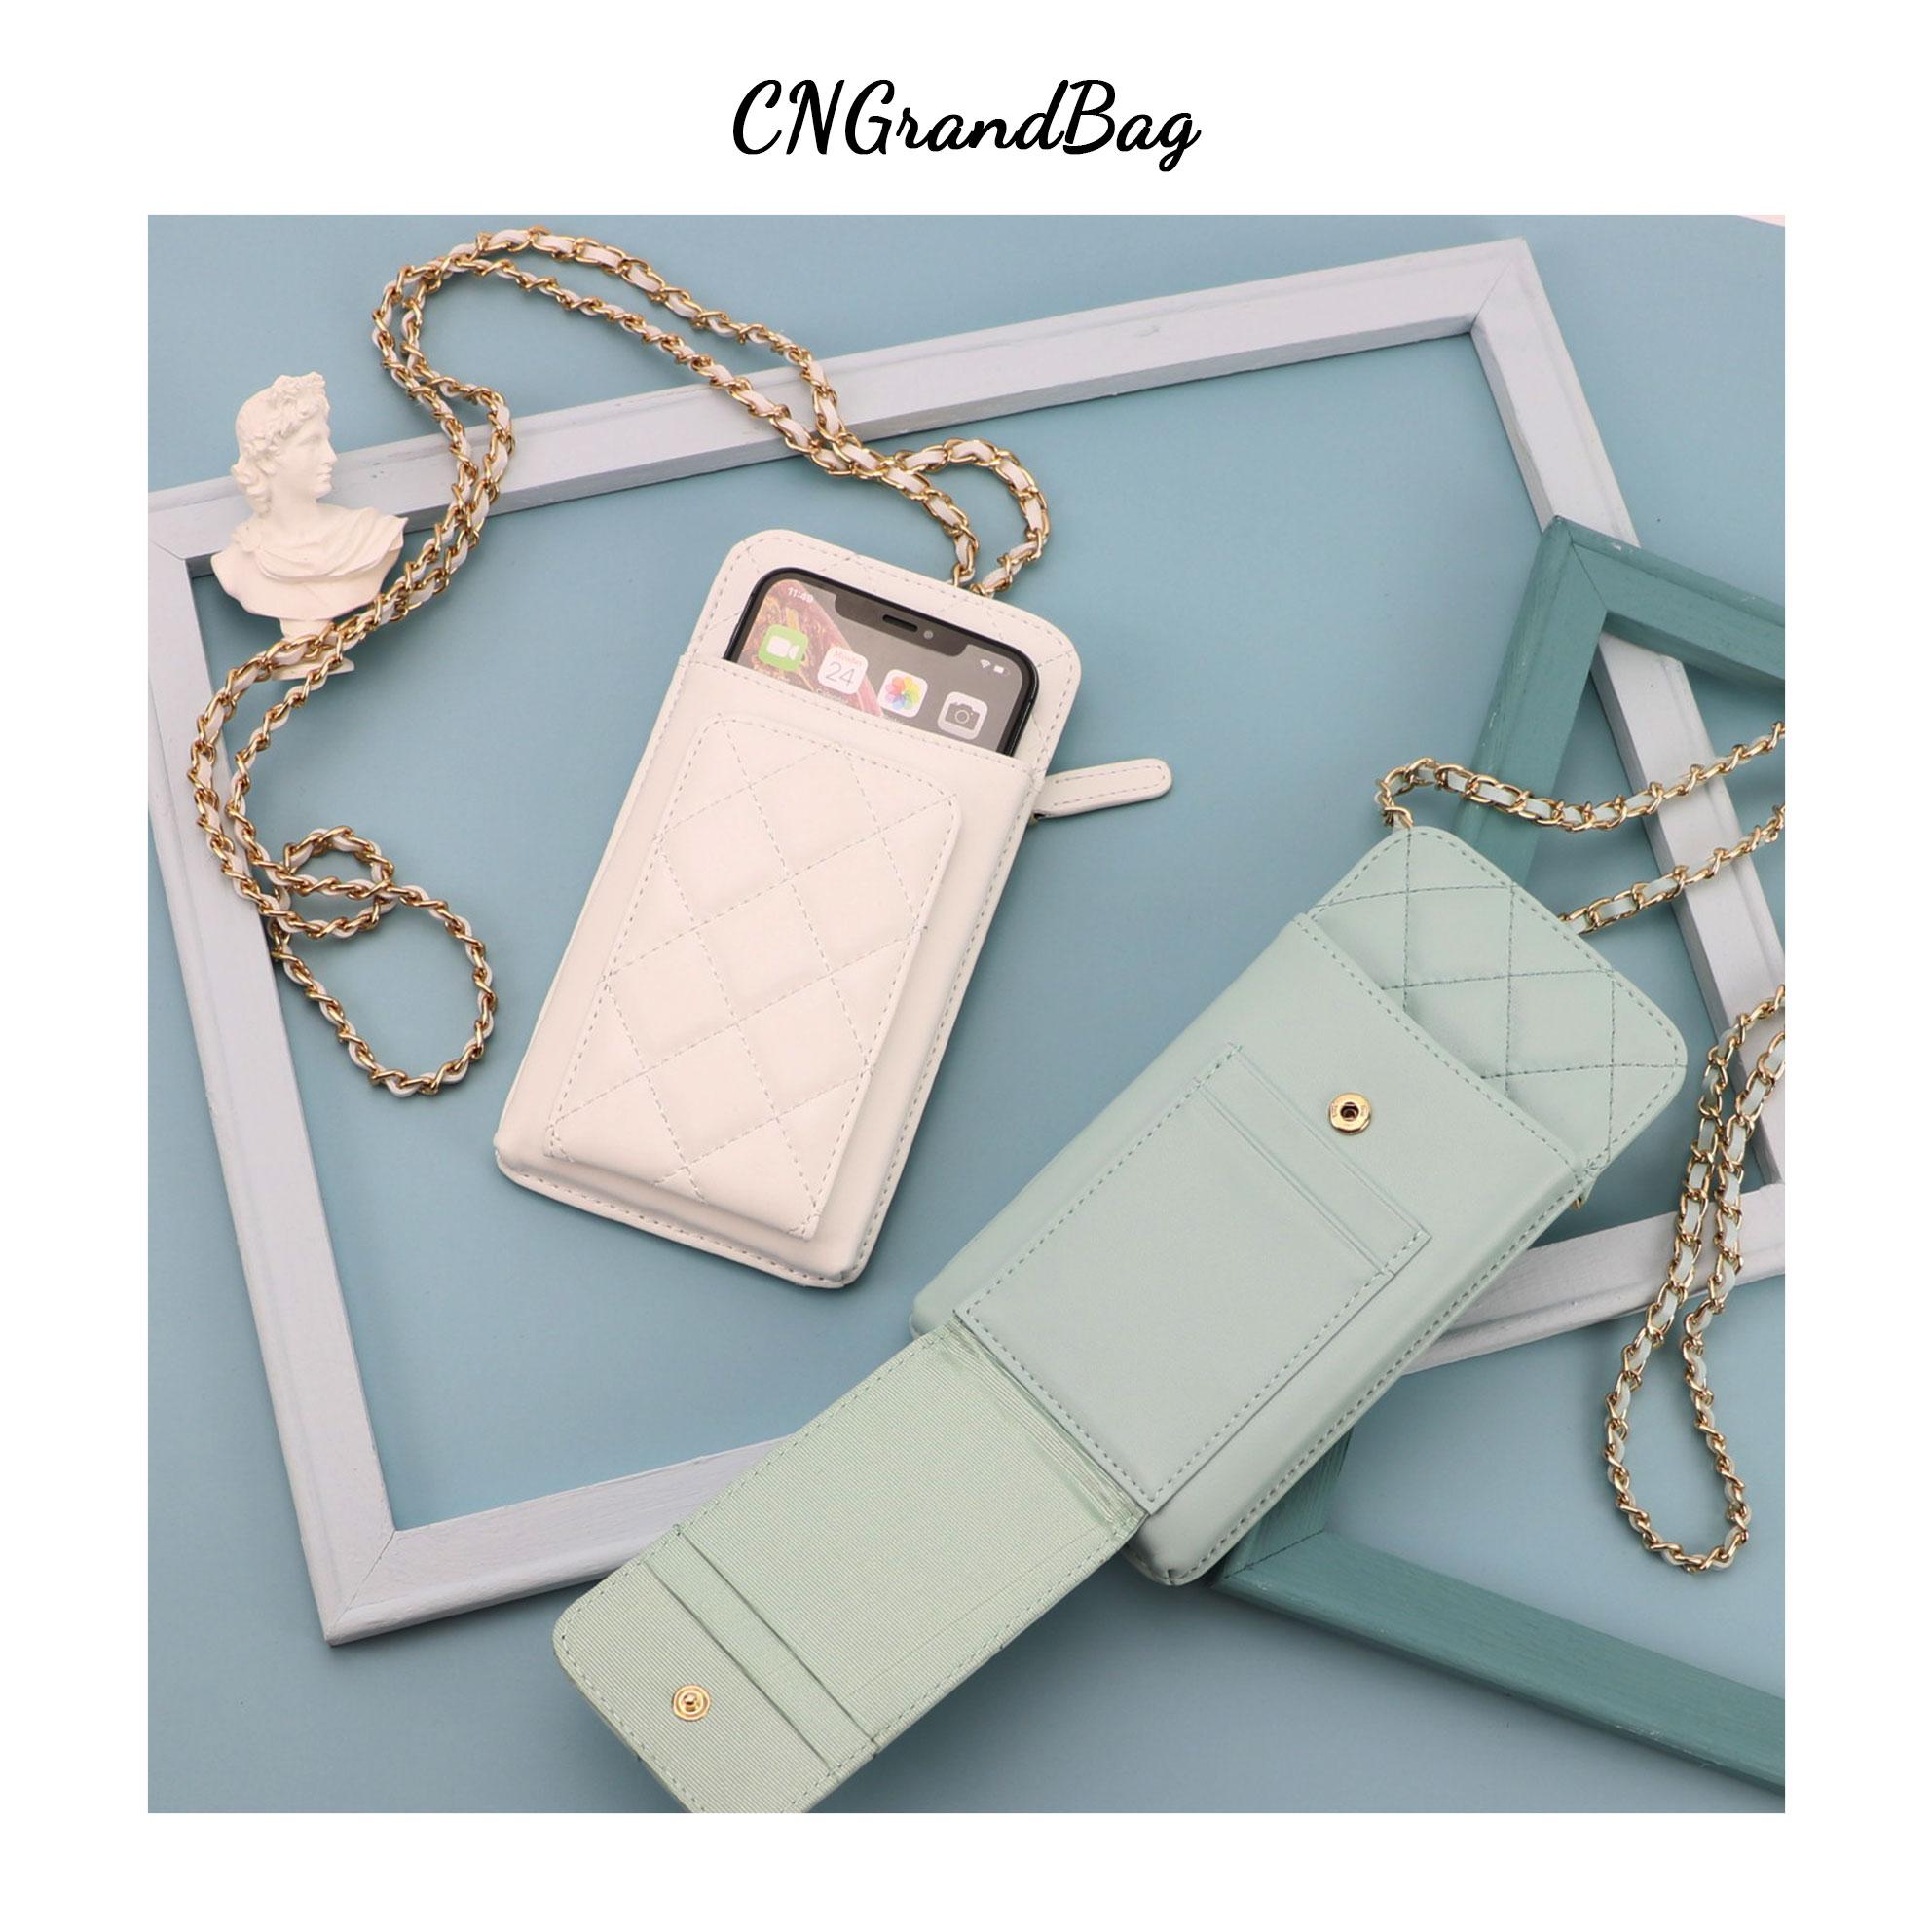 Nuevo bolso para teléfono móvil de piel de oveja cosido, Mini bolsa cruzada de cuero genuino para teléfono, bandolera de cuero para mujer